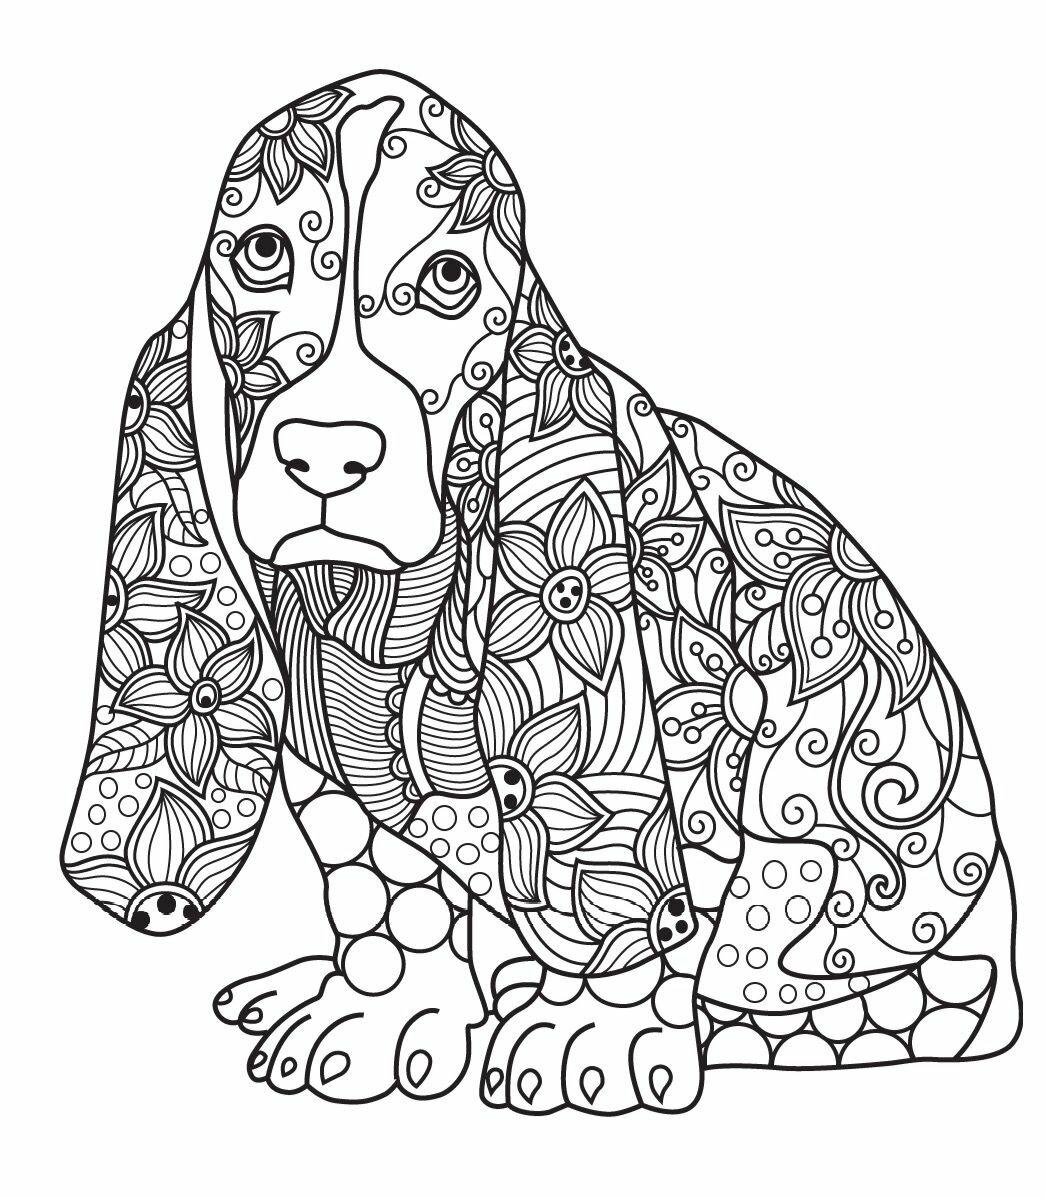 Антистресс картинки с животными